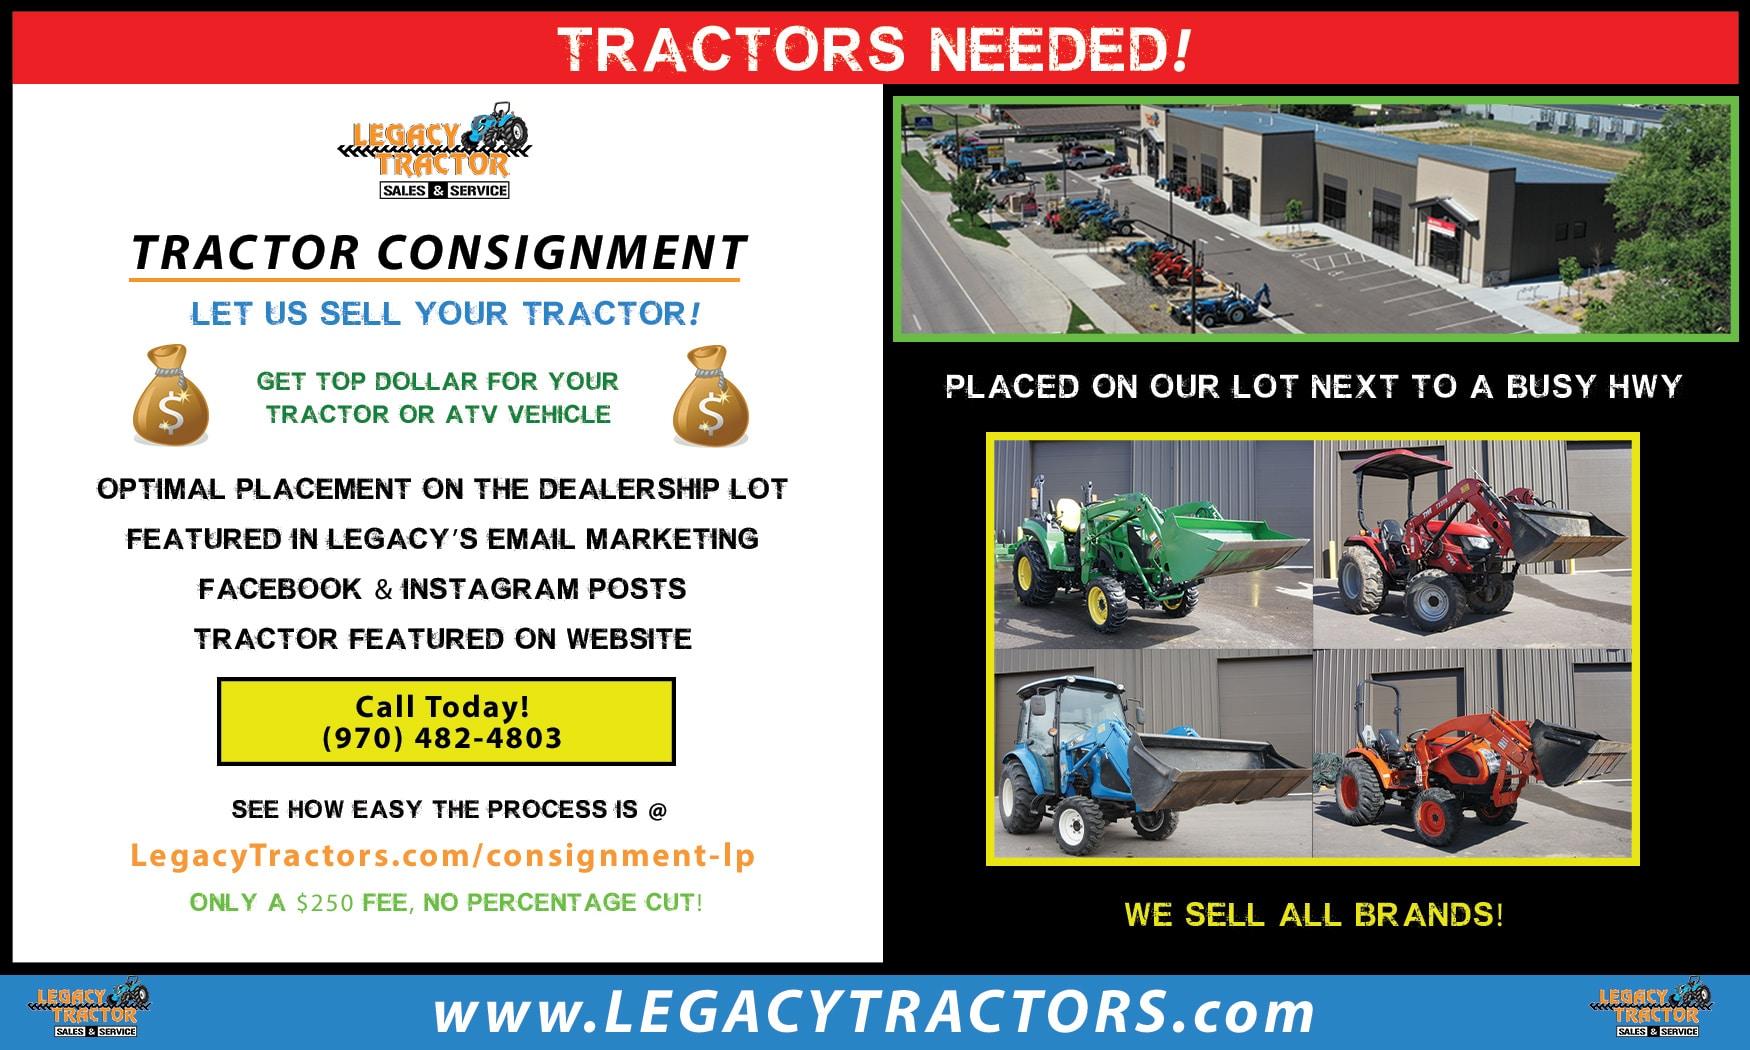 Legacy-Tractors---2021-Tractors-Needed-(Consignment)-3